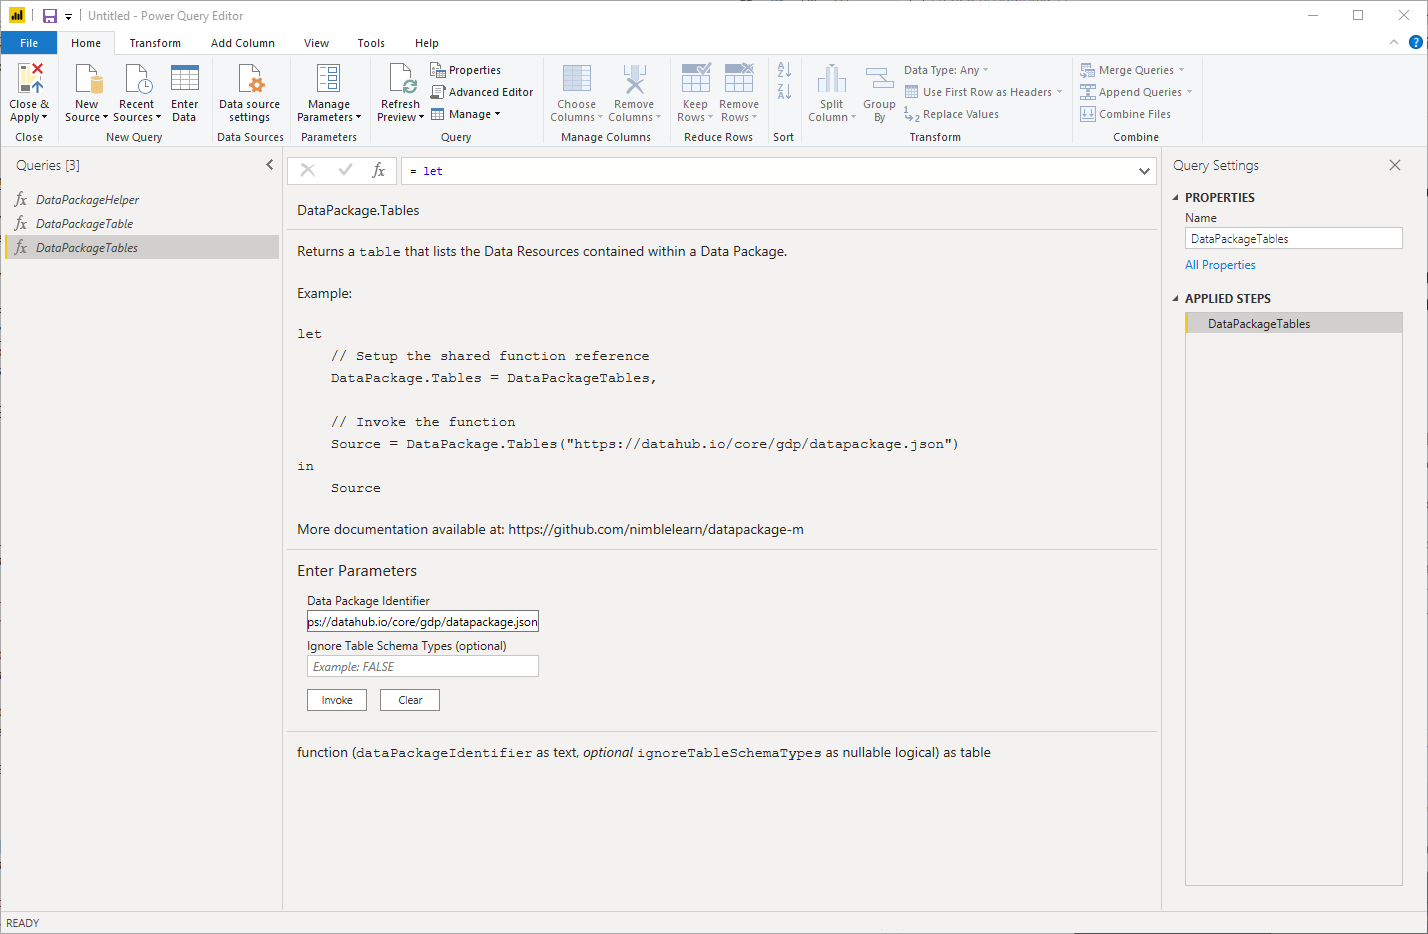 Microsoft Power BI UI: Invoke Function